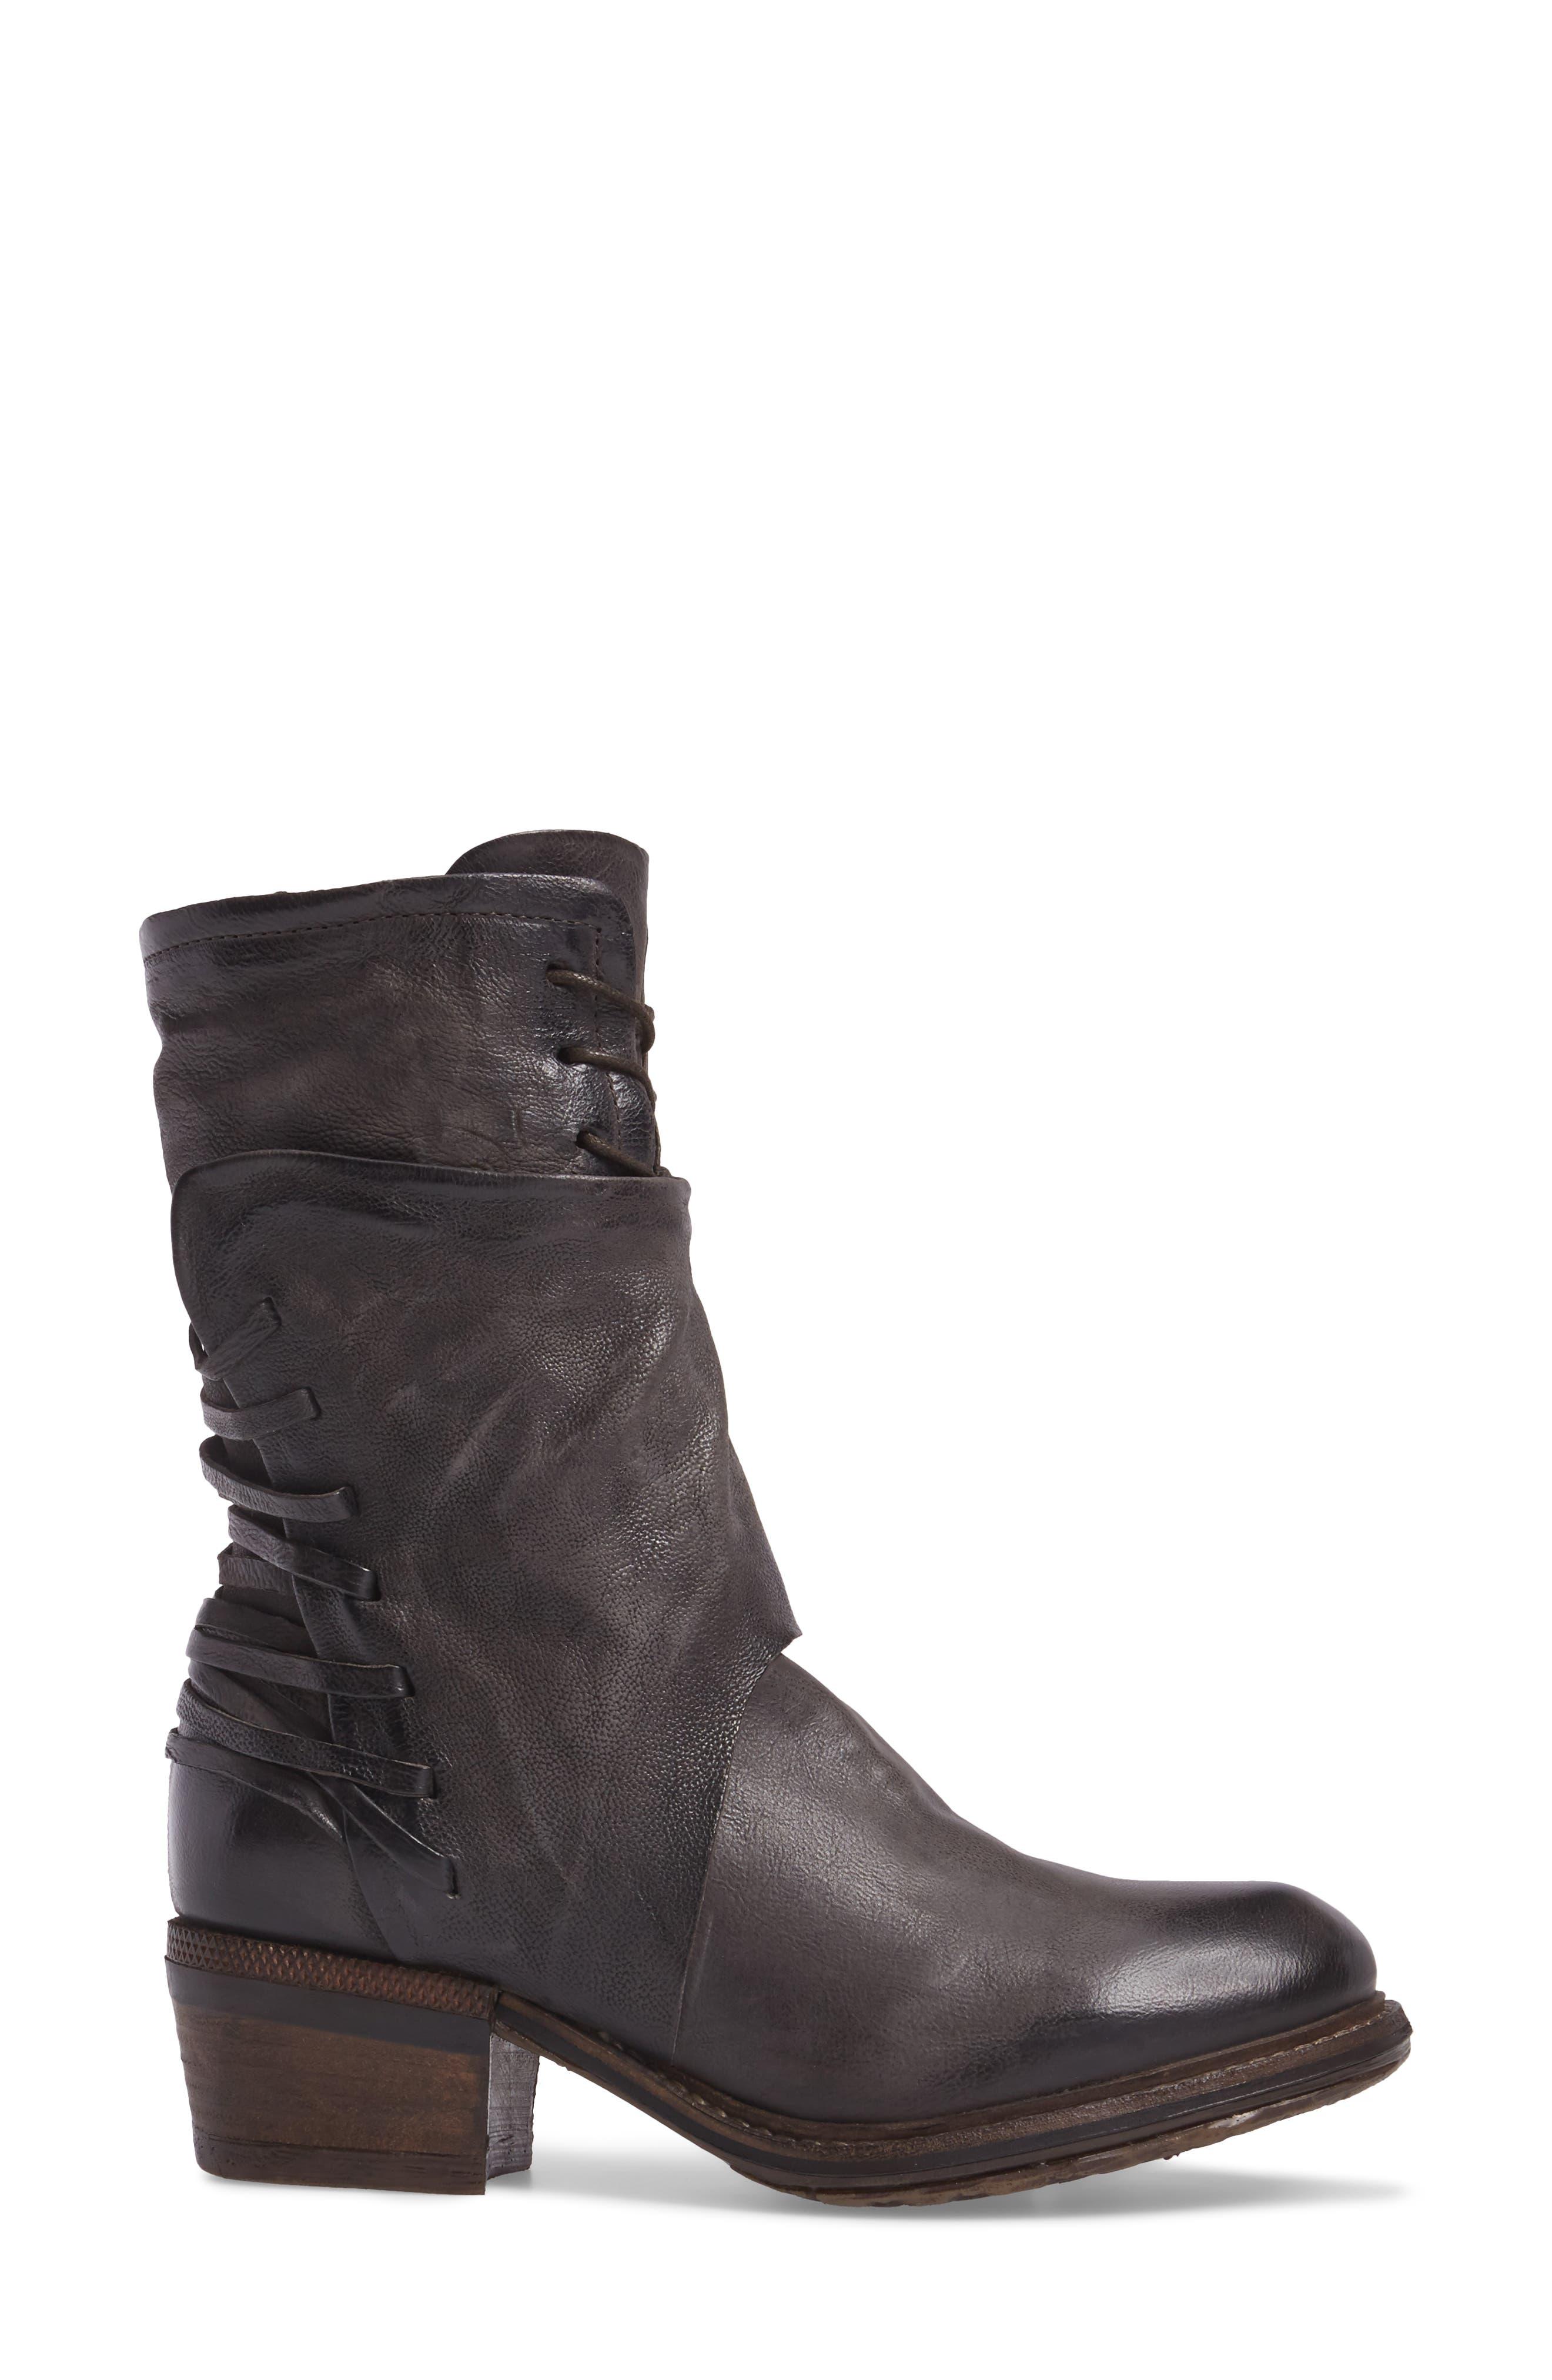 A.S. 98 Chet Boot,                             Alternate thumbnail 3, color,                             096